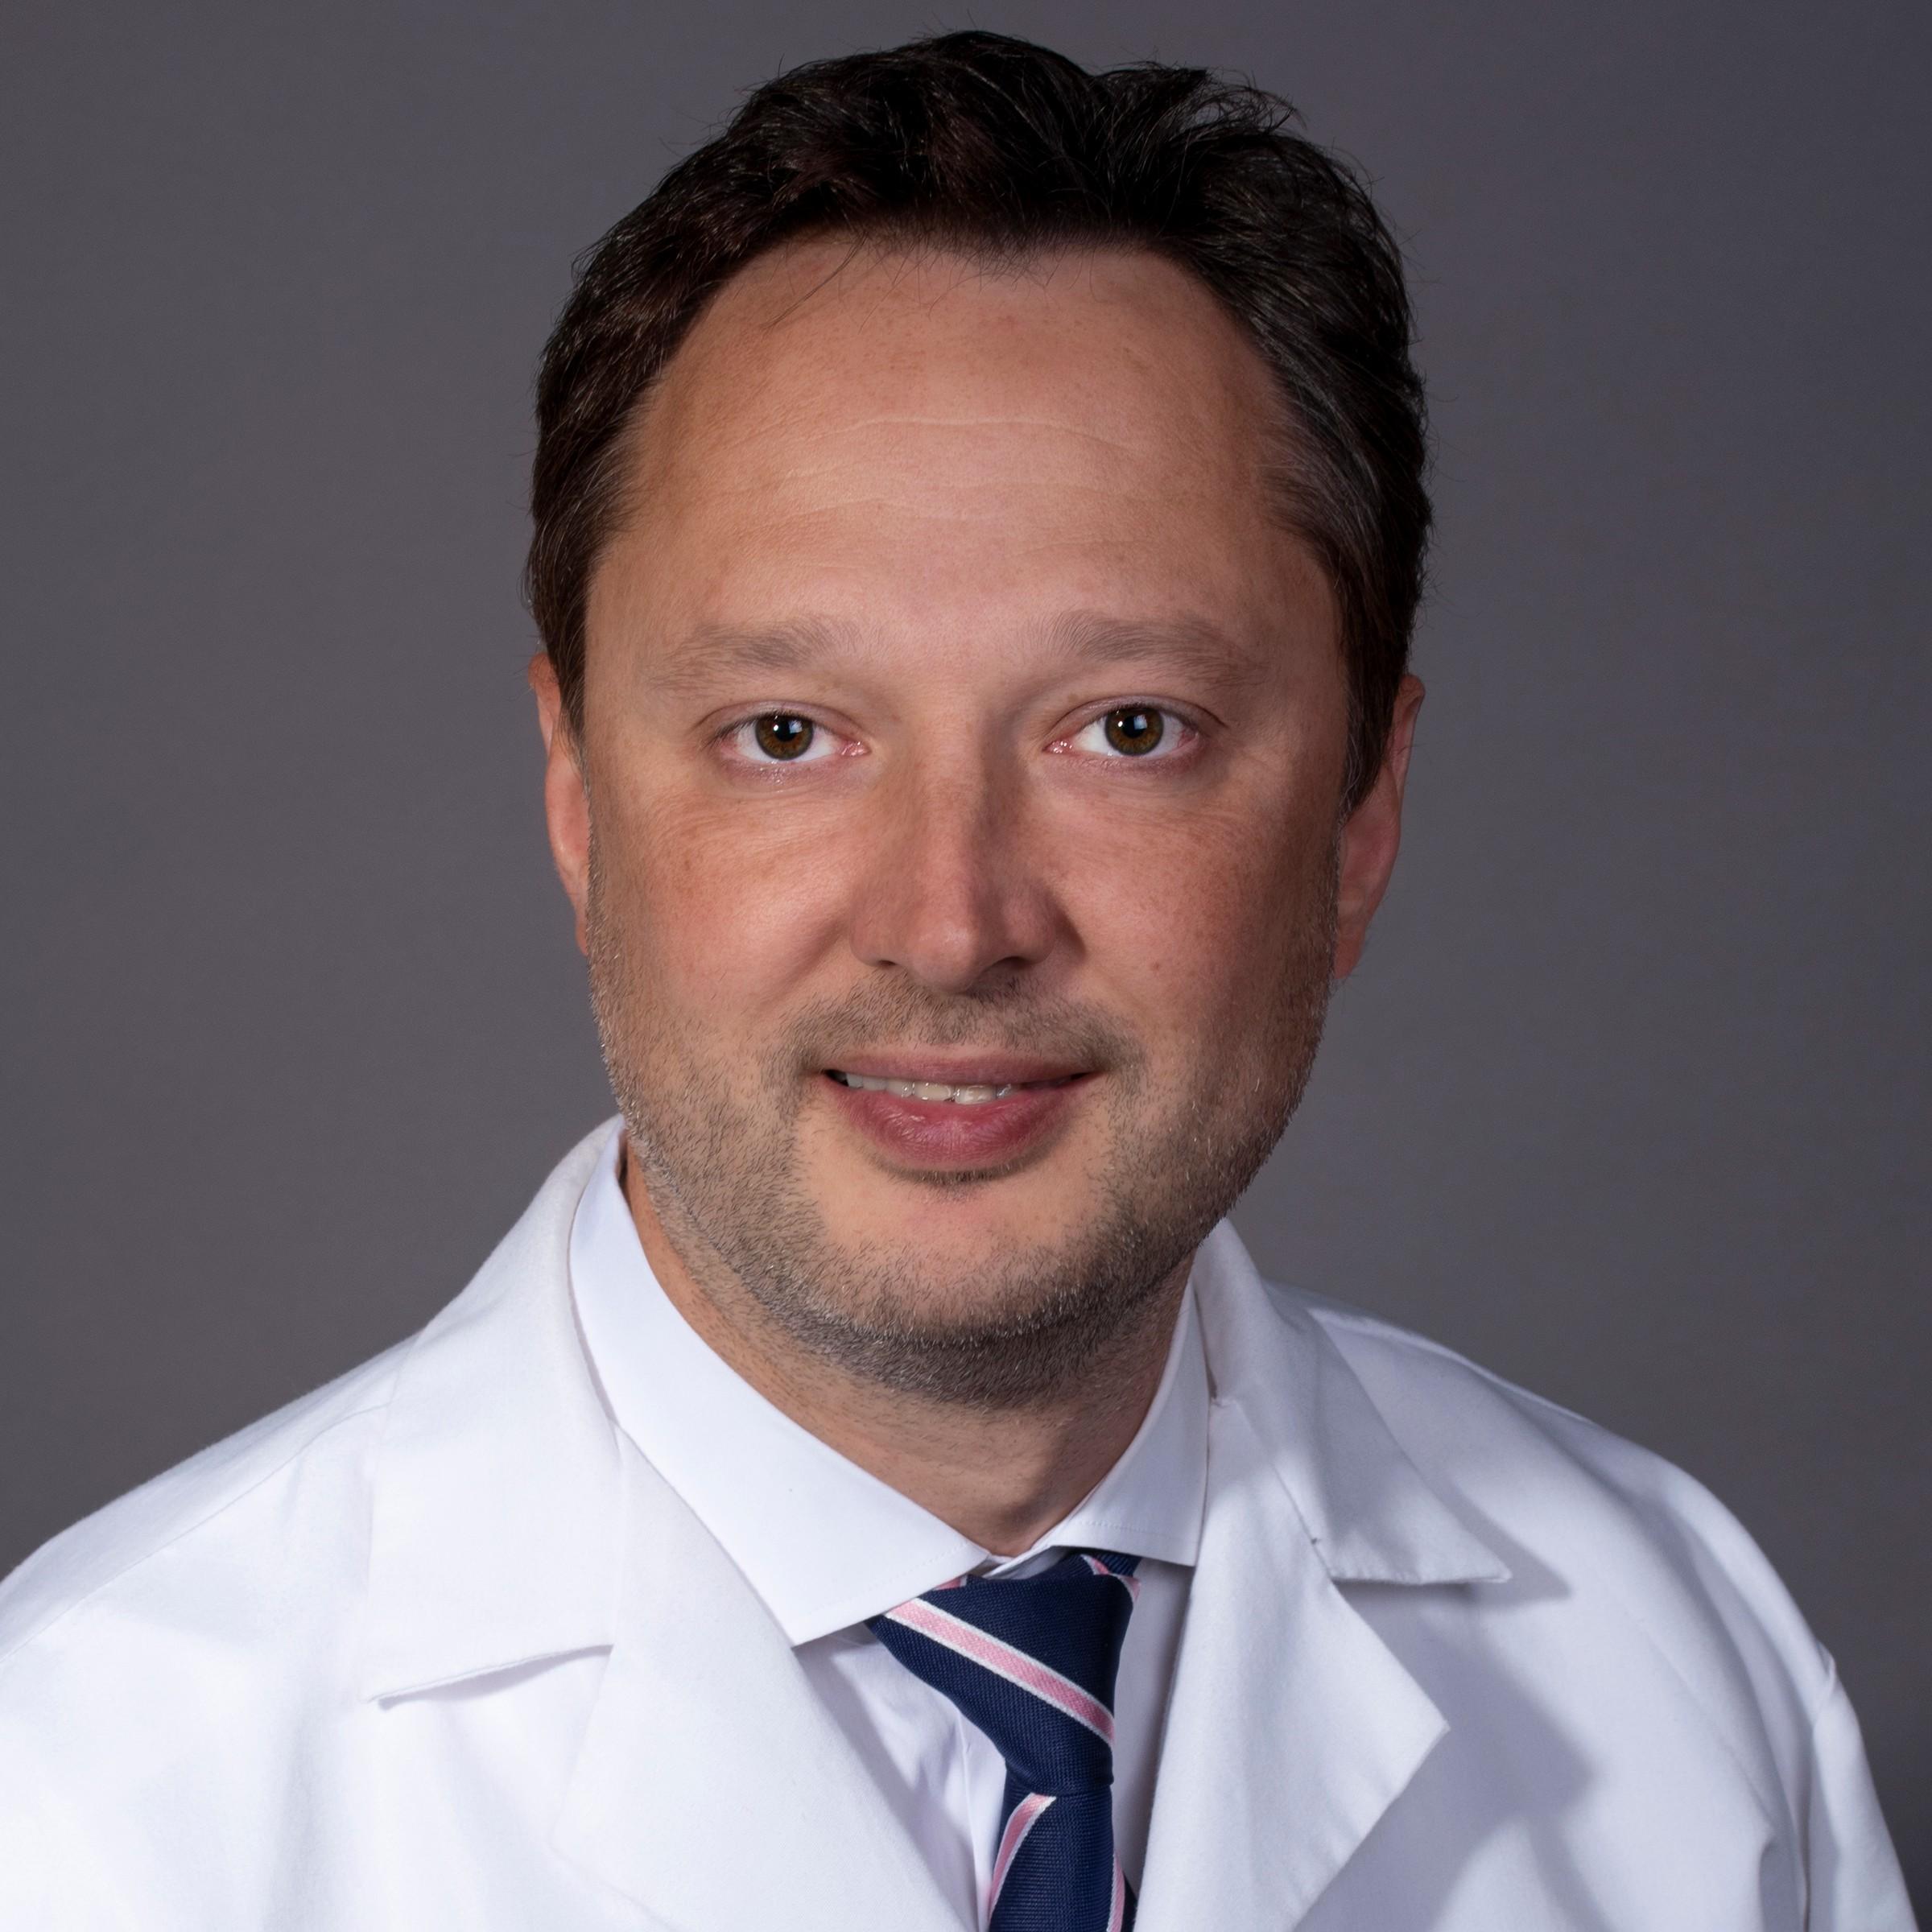 Constantine Gorelick